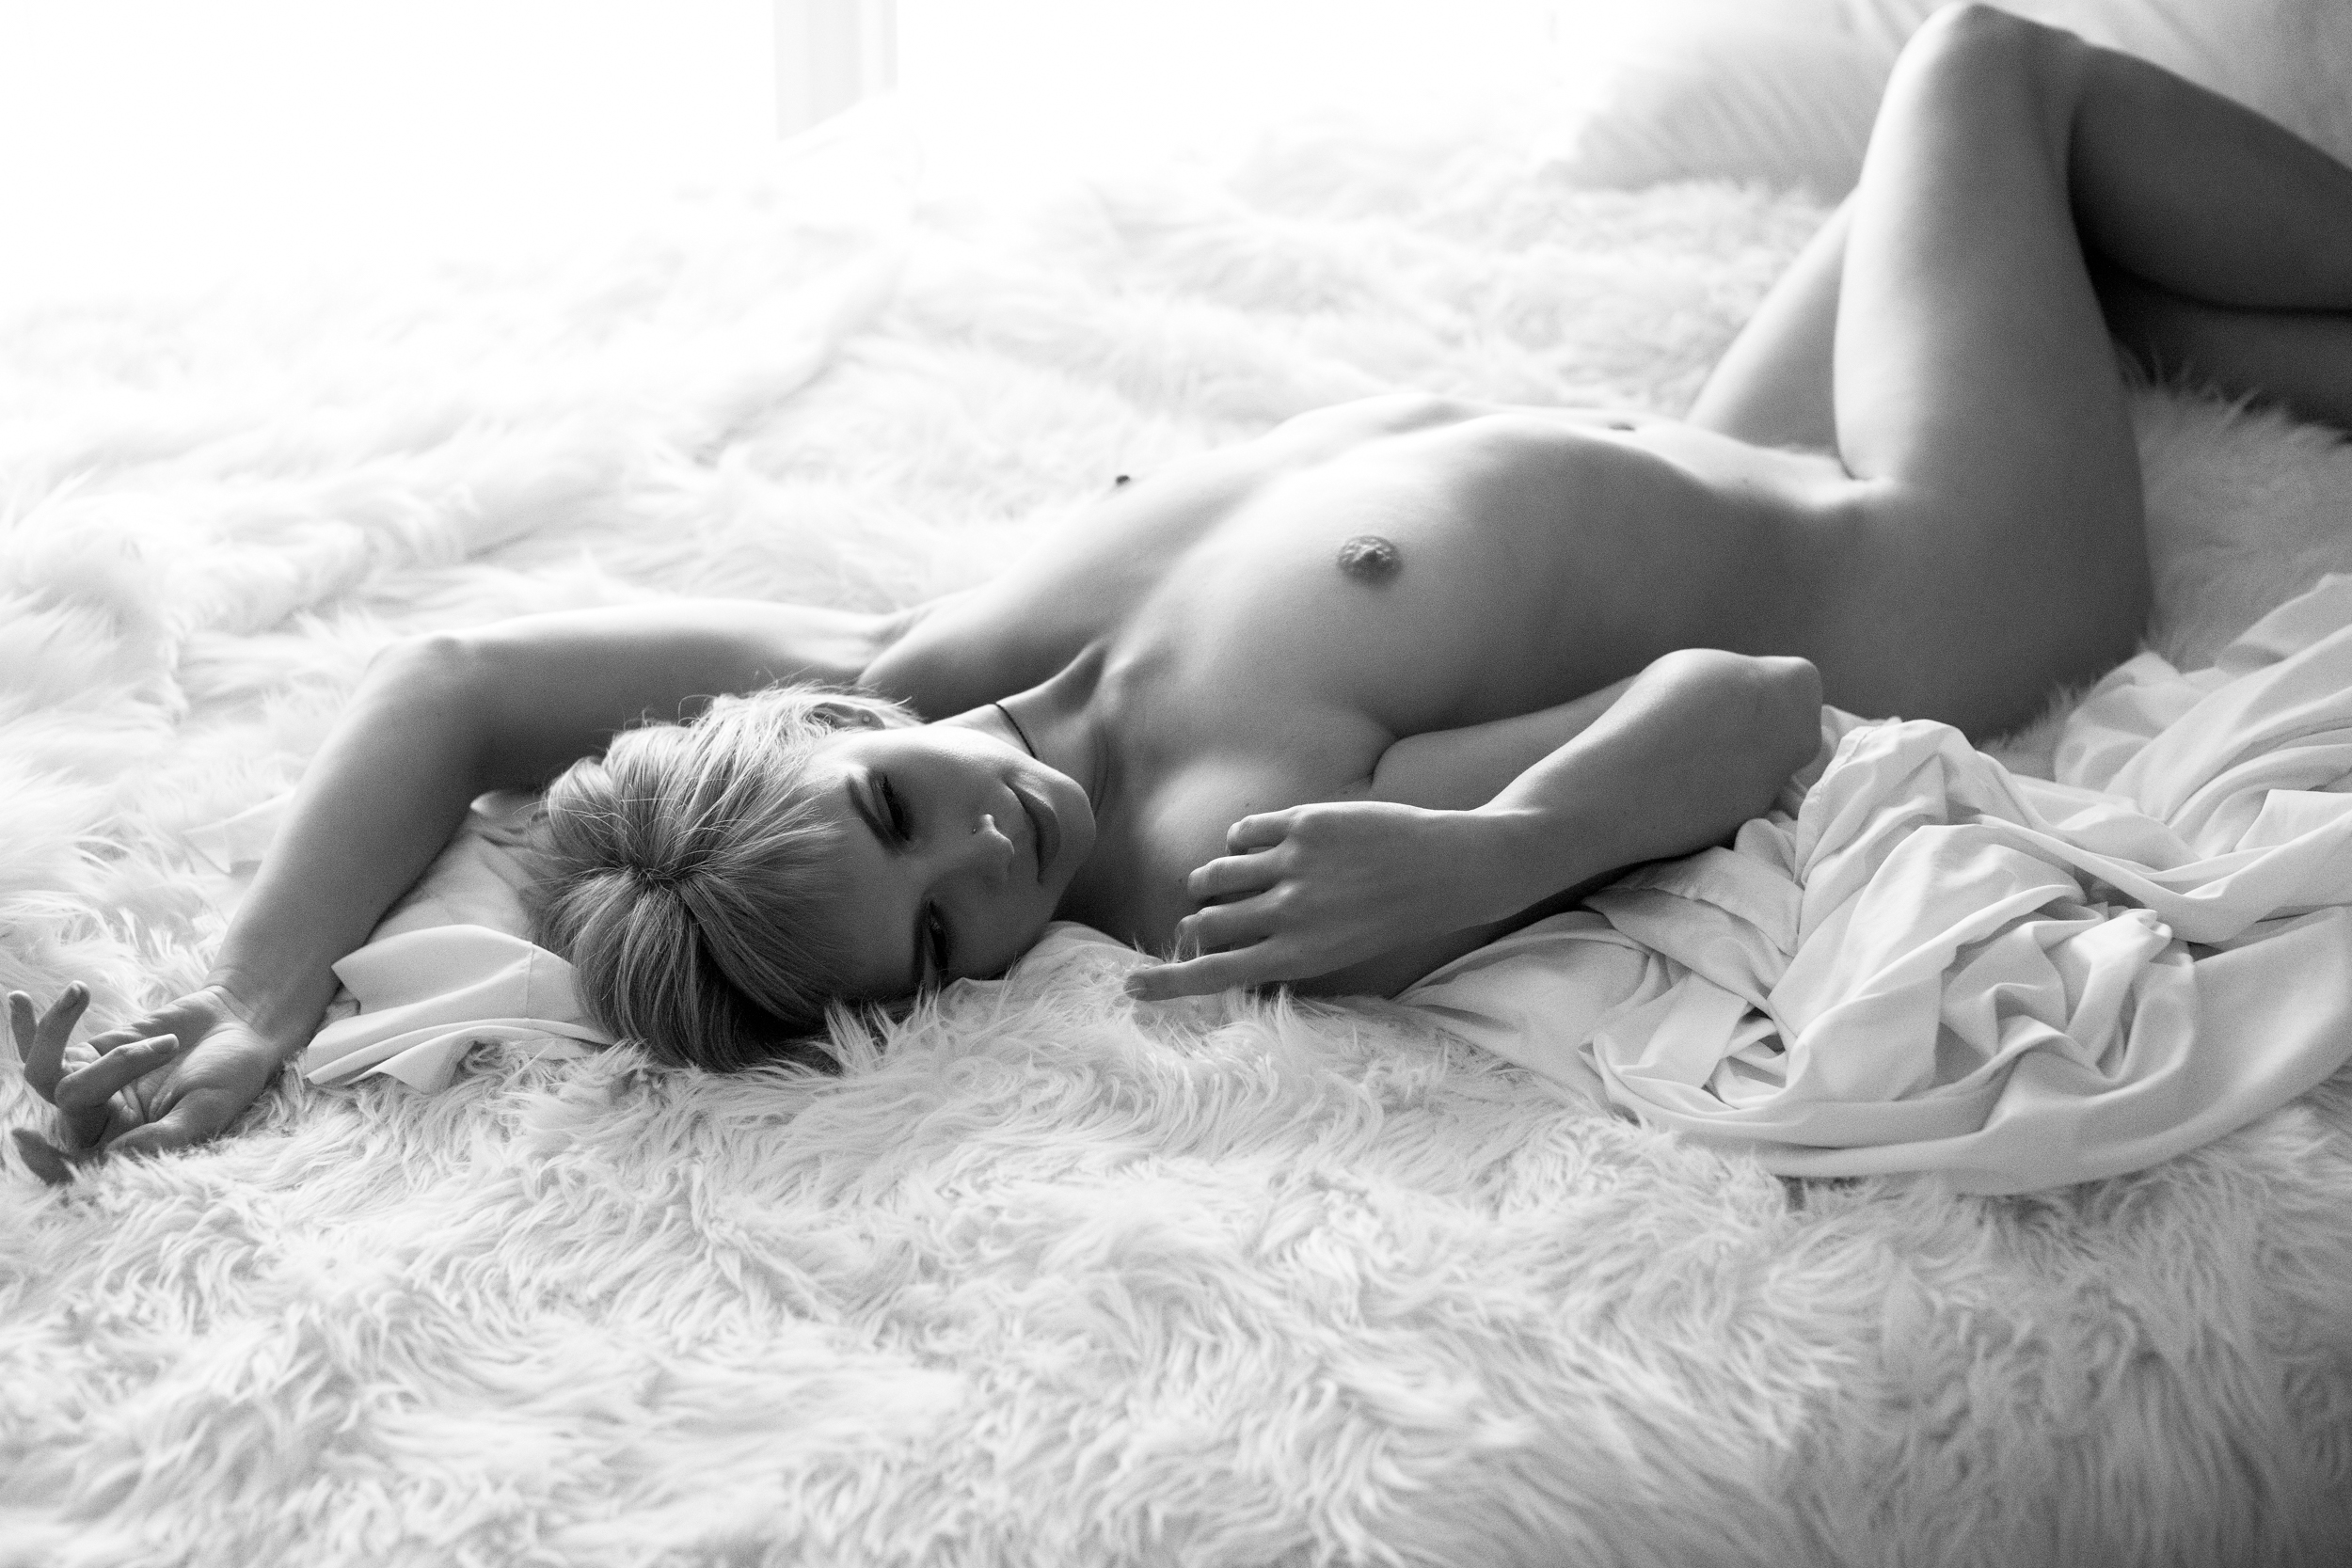 Boudoir-Photography-Victoria-Sarah-12.jpg